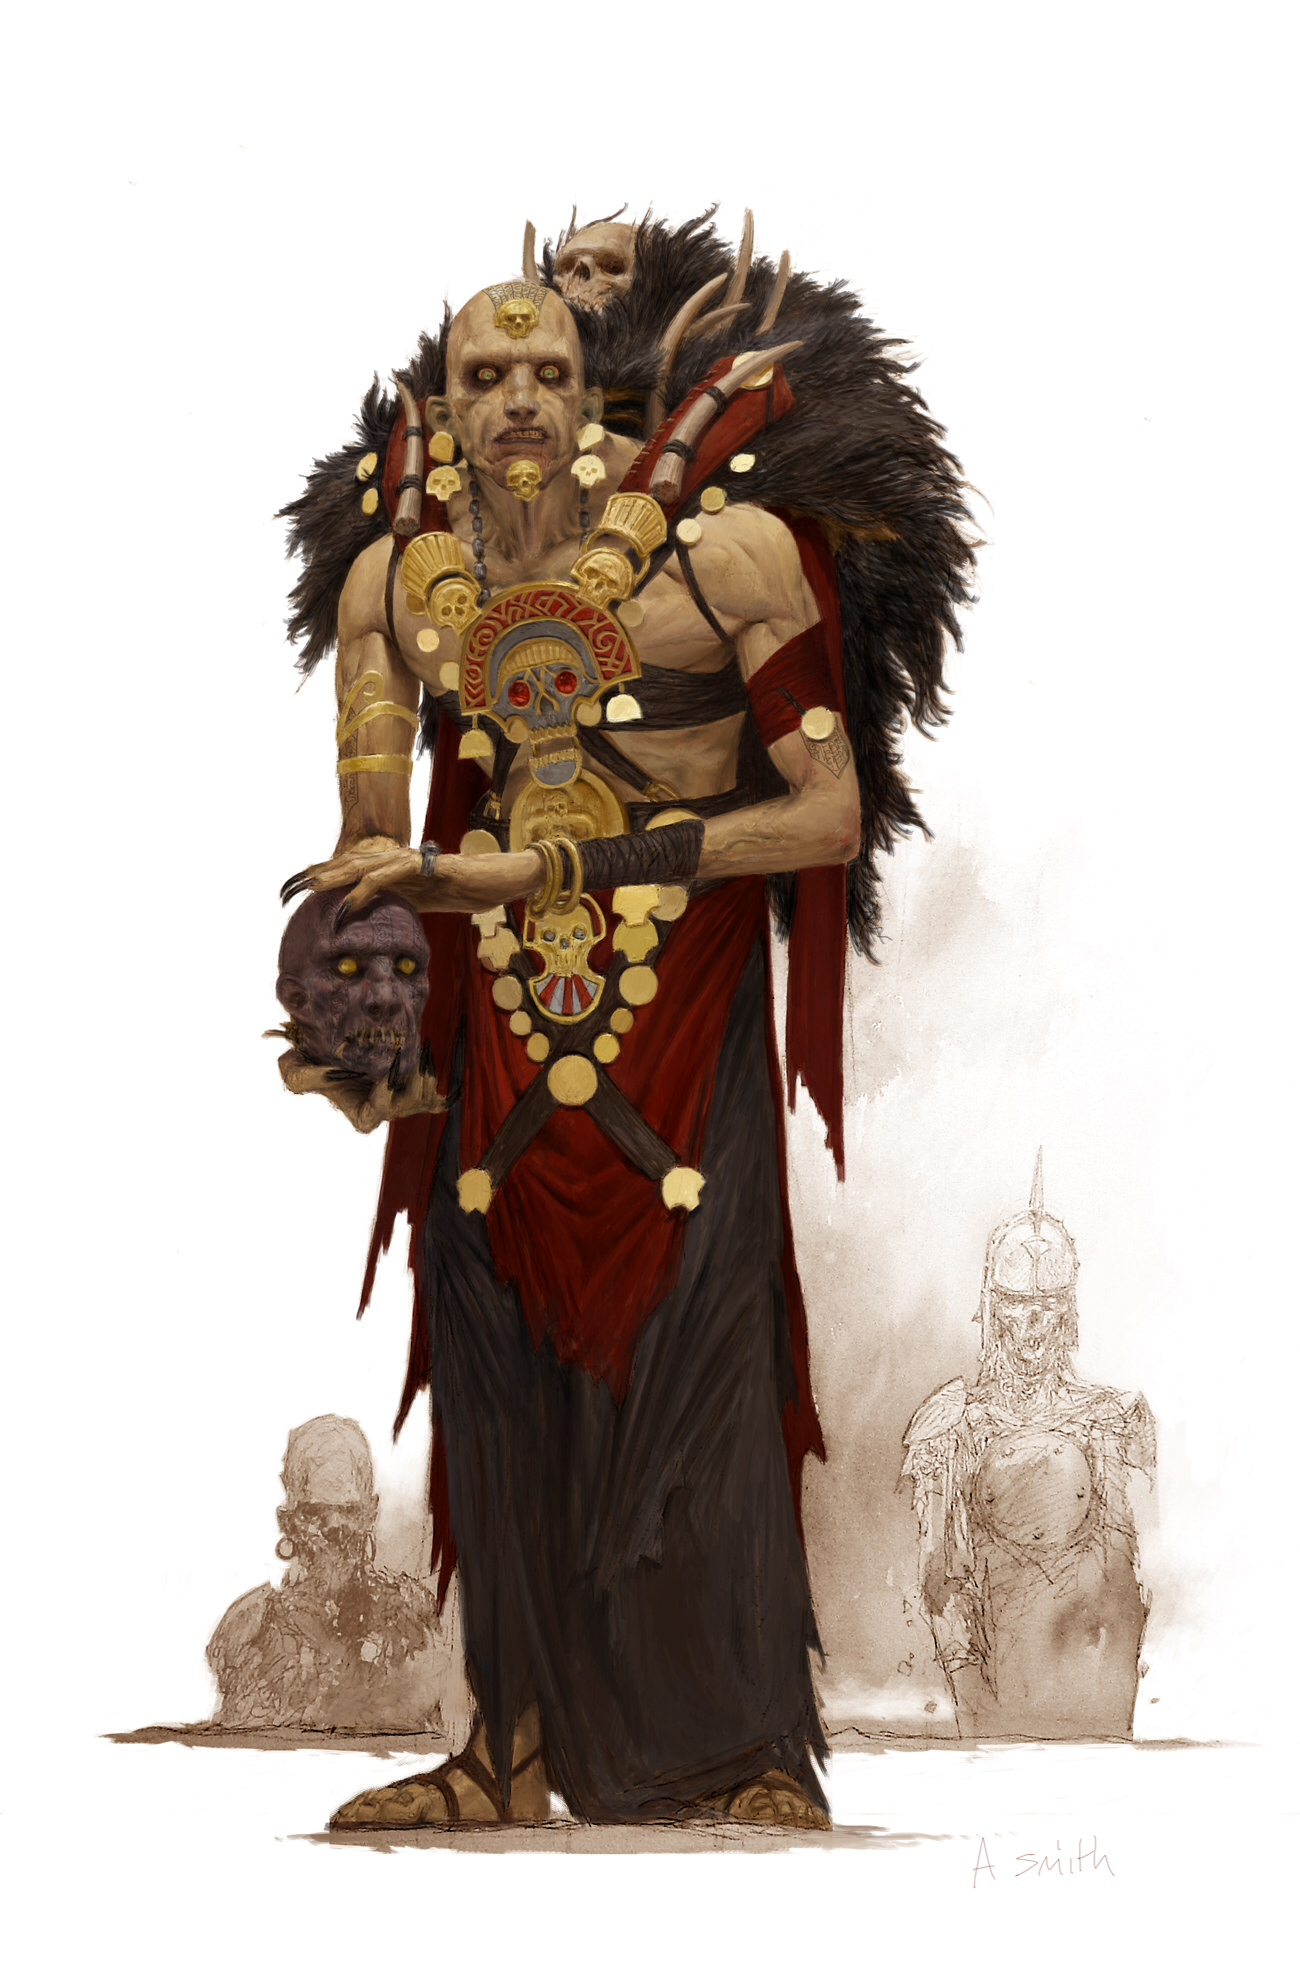 Conan: The Legend - Necromancer (Copyright/Image: Monolith)